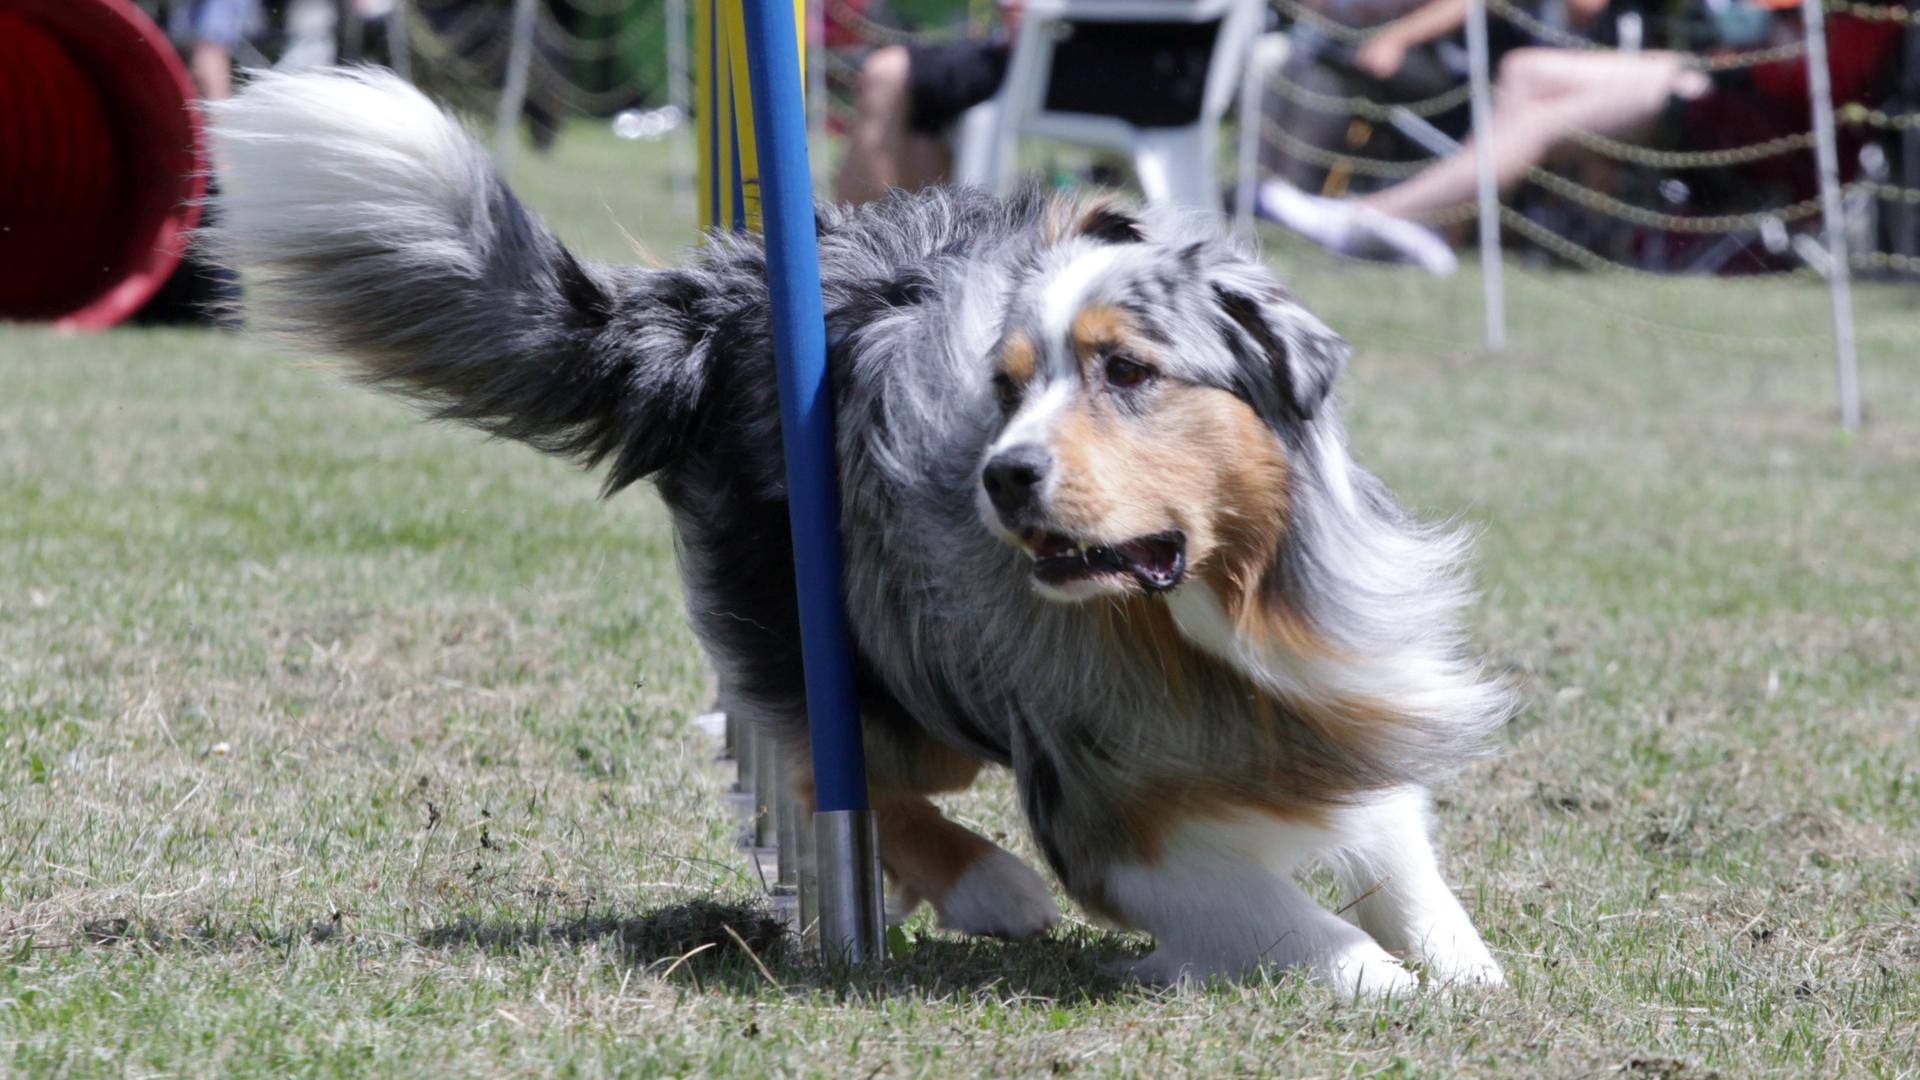 Ein Hund beim Agility-Training im Stangenslalom.